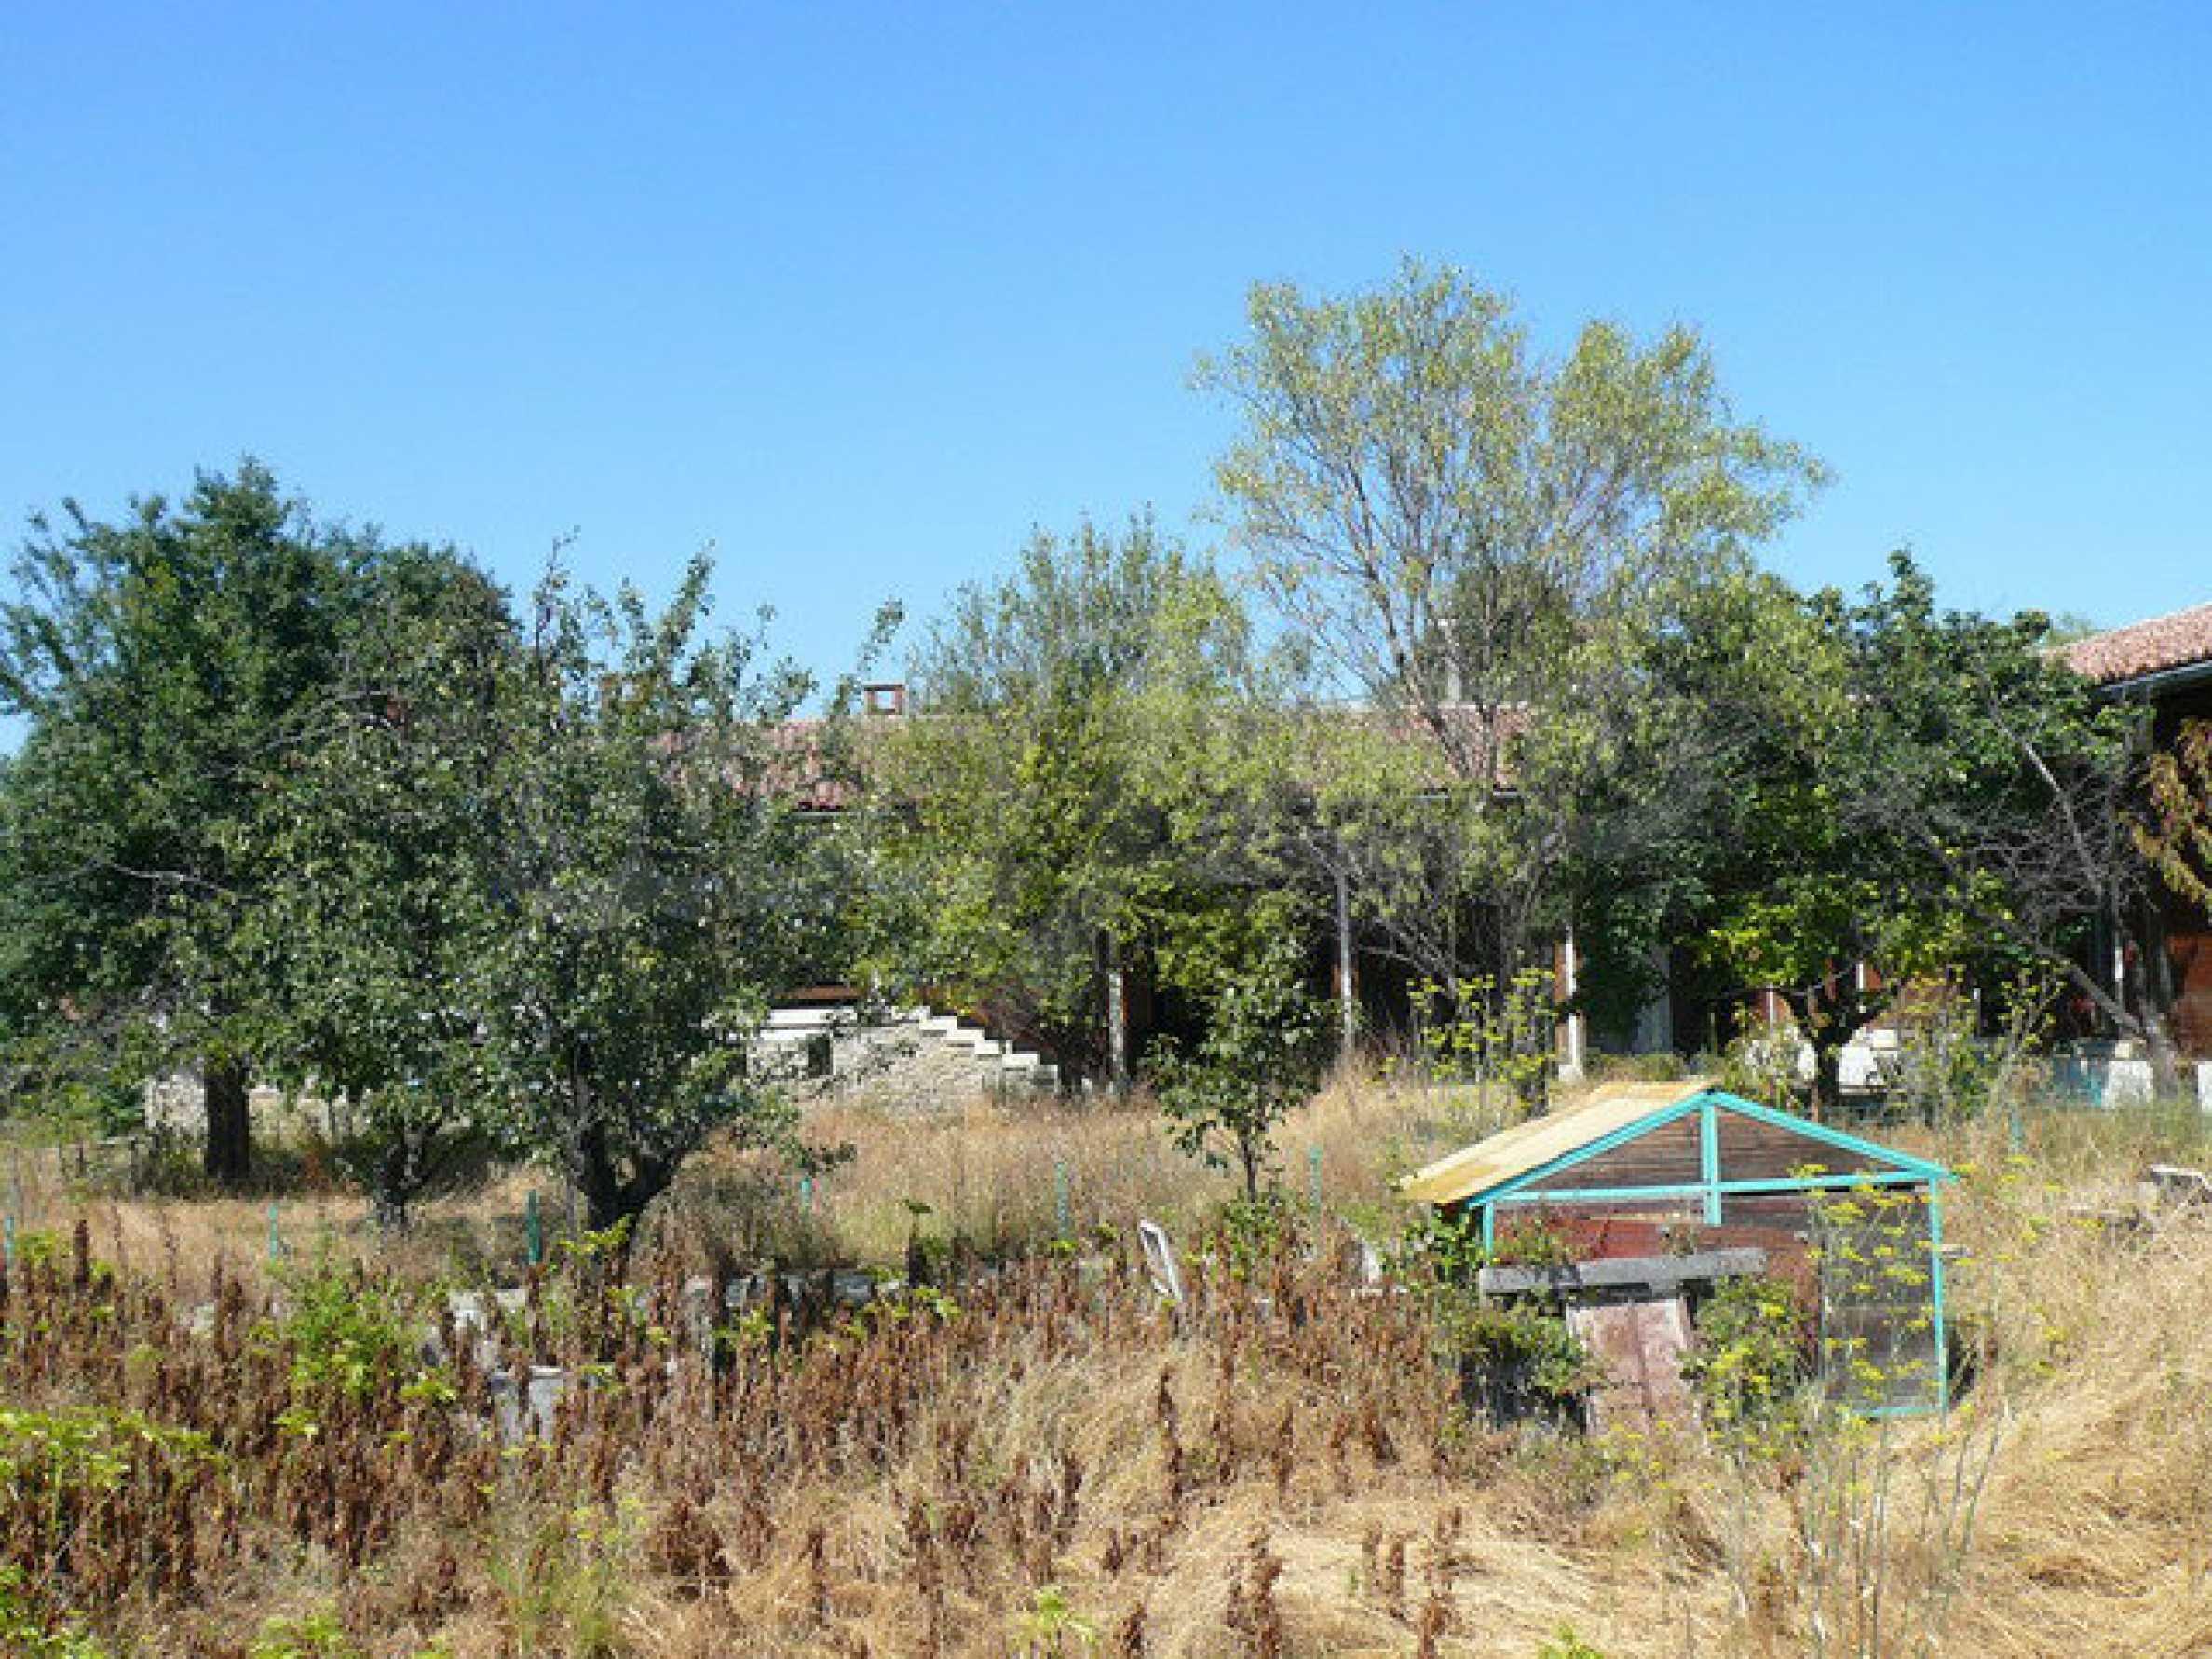 Renoviertes Haus nur 3 km von Veliko Tarnovo entfernt 45